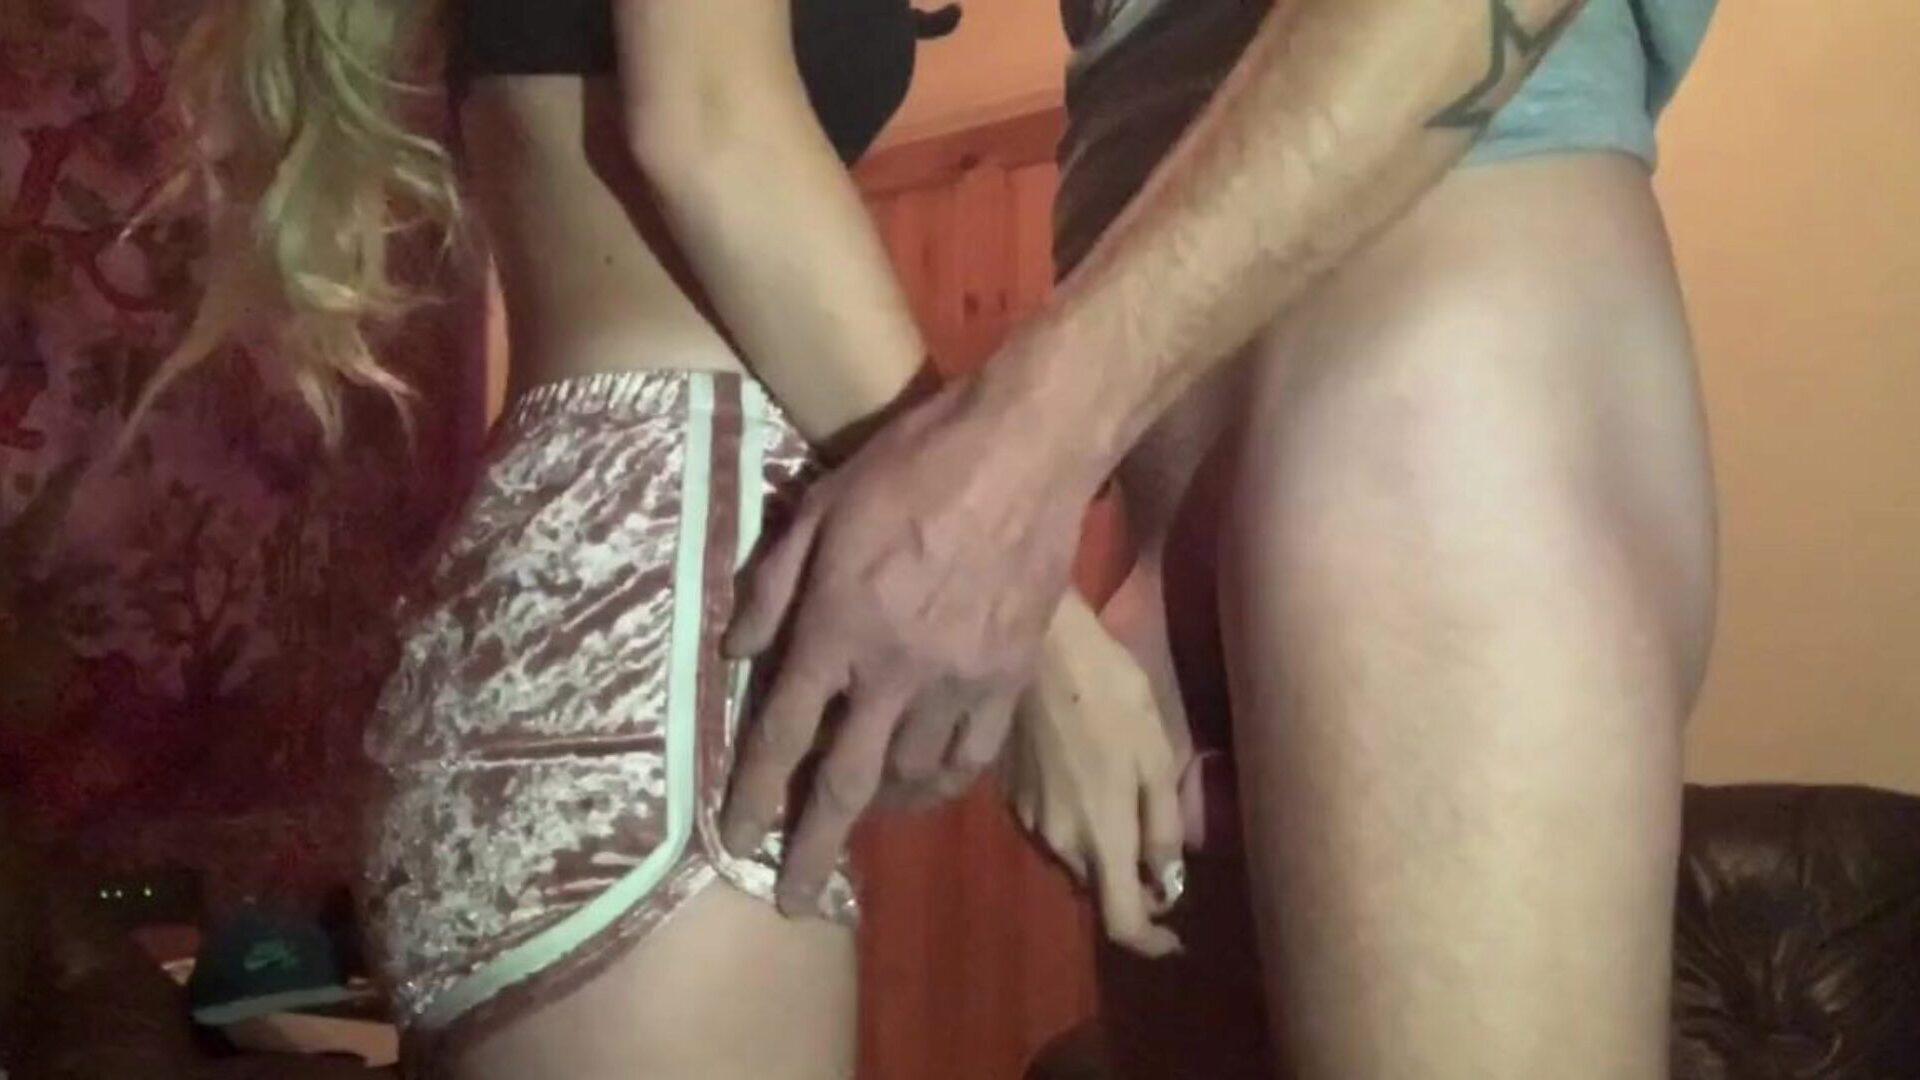 Naked girls mutual masturbation Masturbating Porn Nude Clap